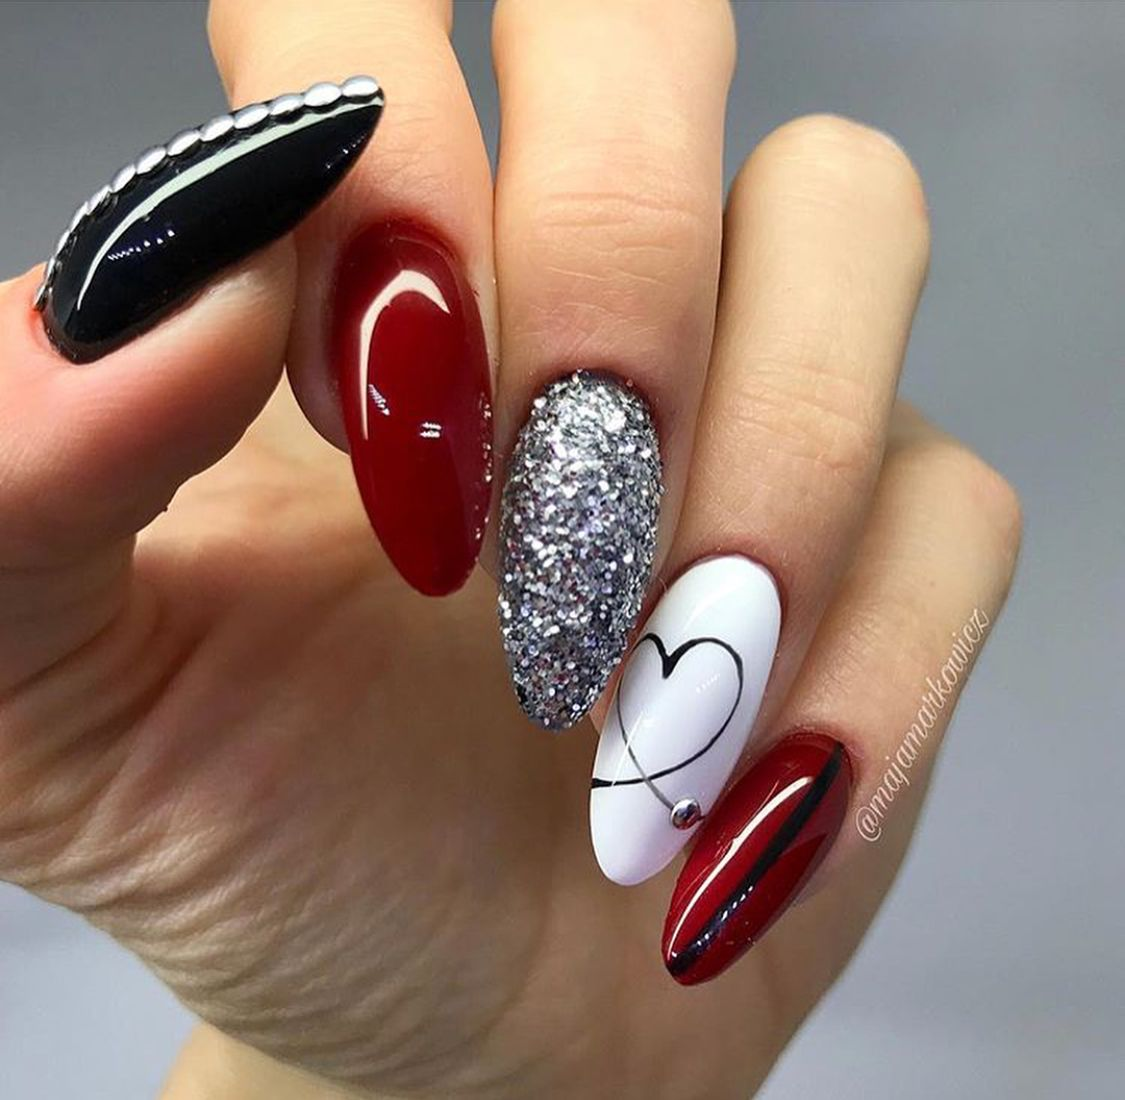 Фото дизайна ногтей новинки для миндалевидных